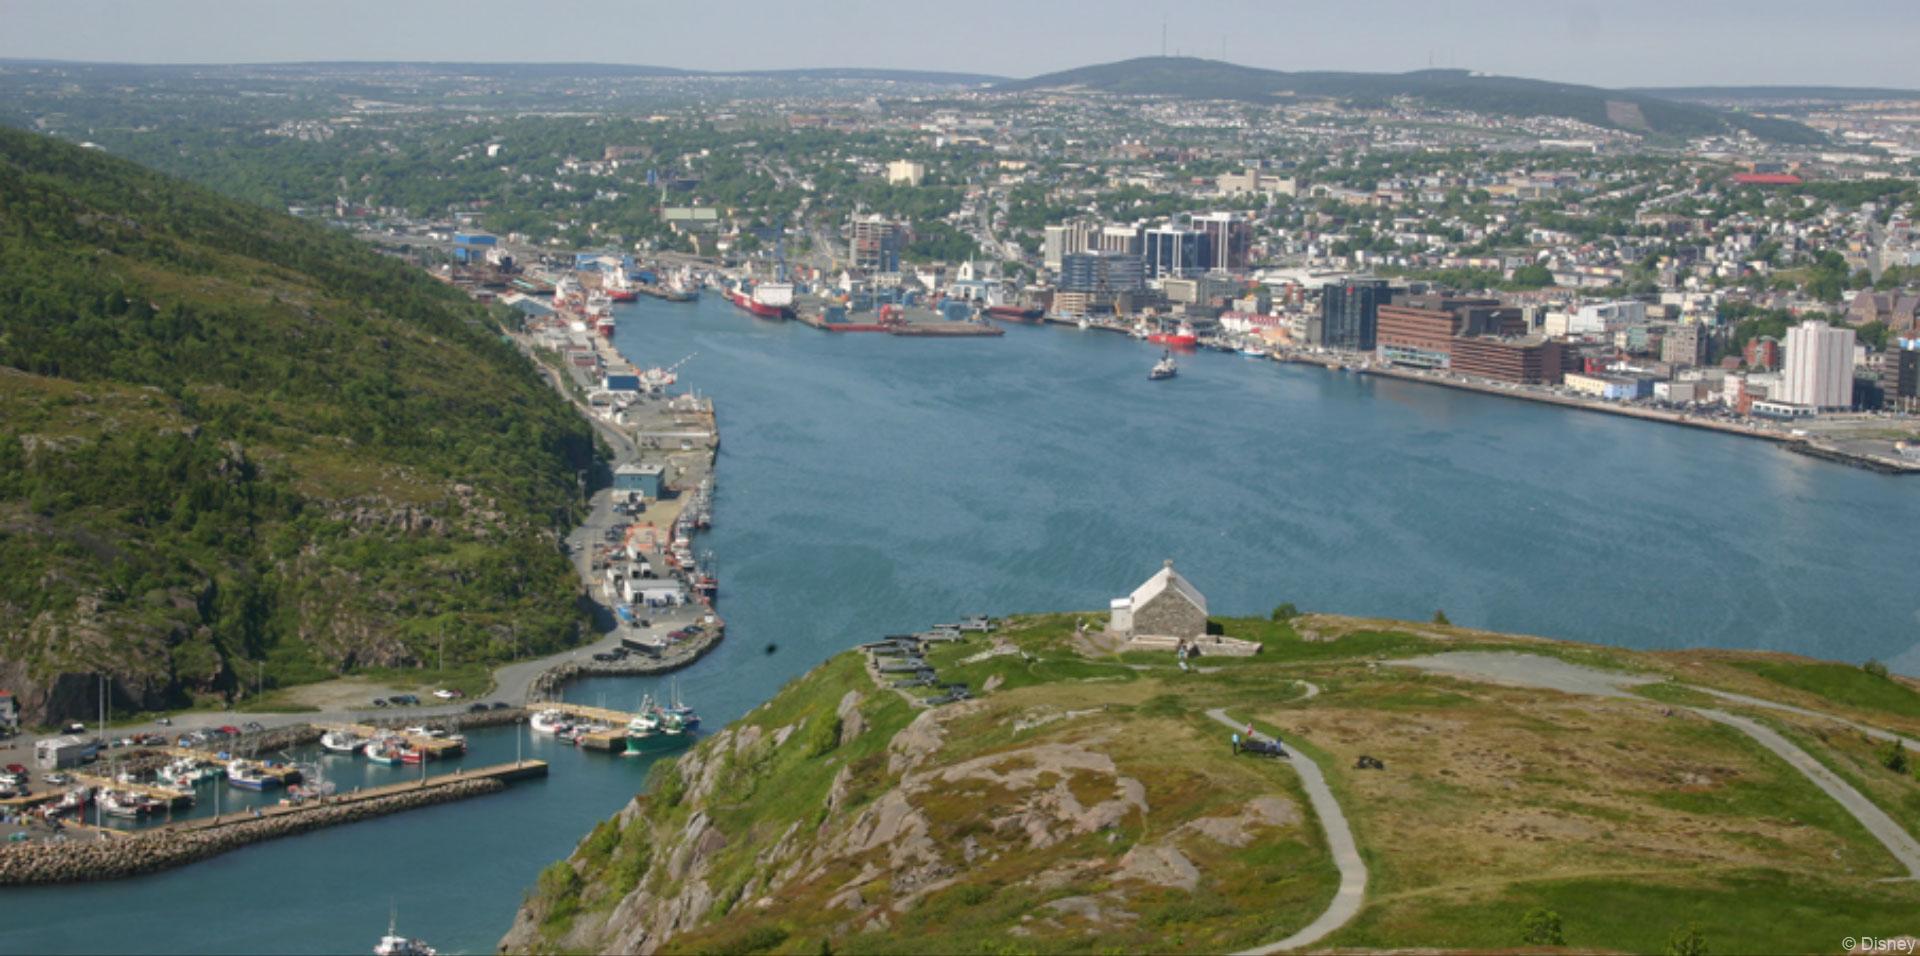 DCL St. John's Newfoundland Port Adventure